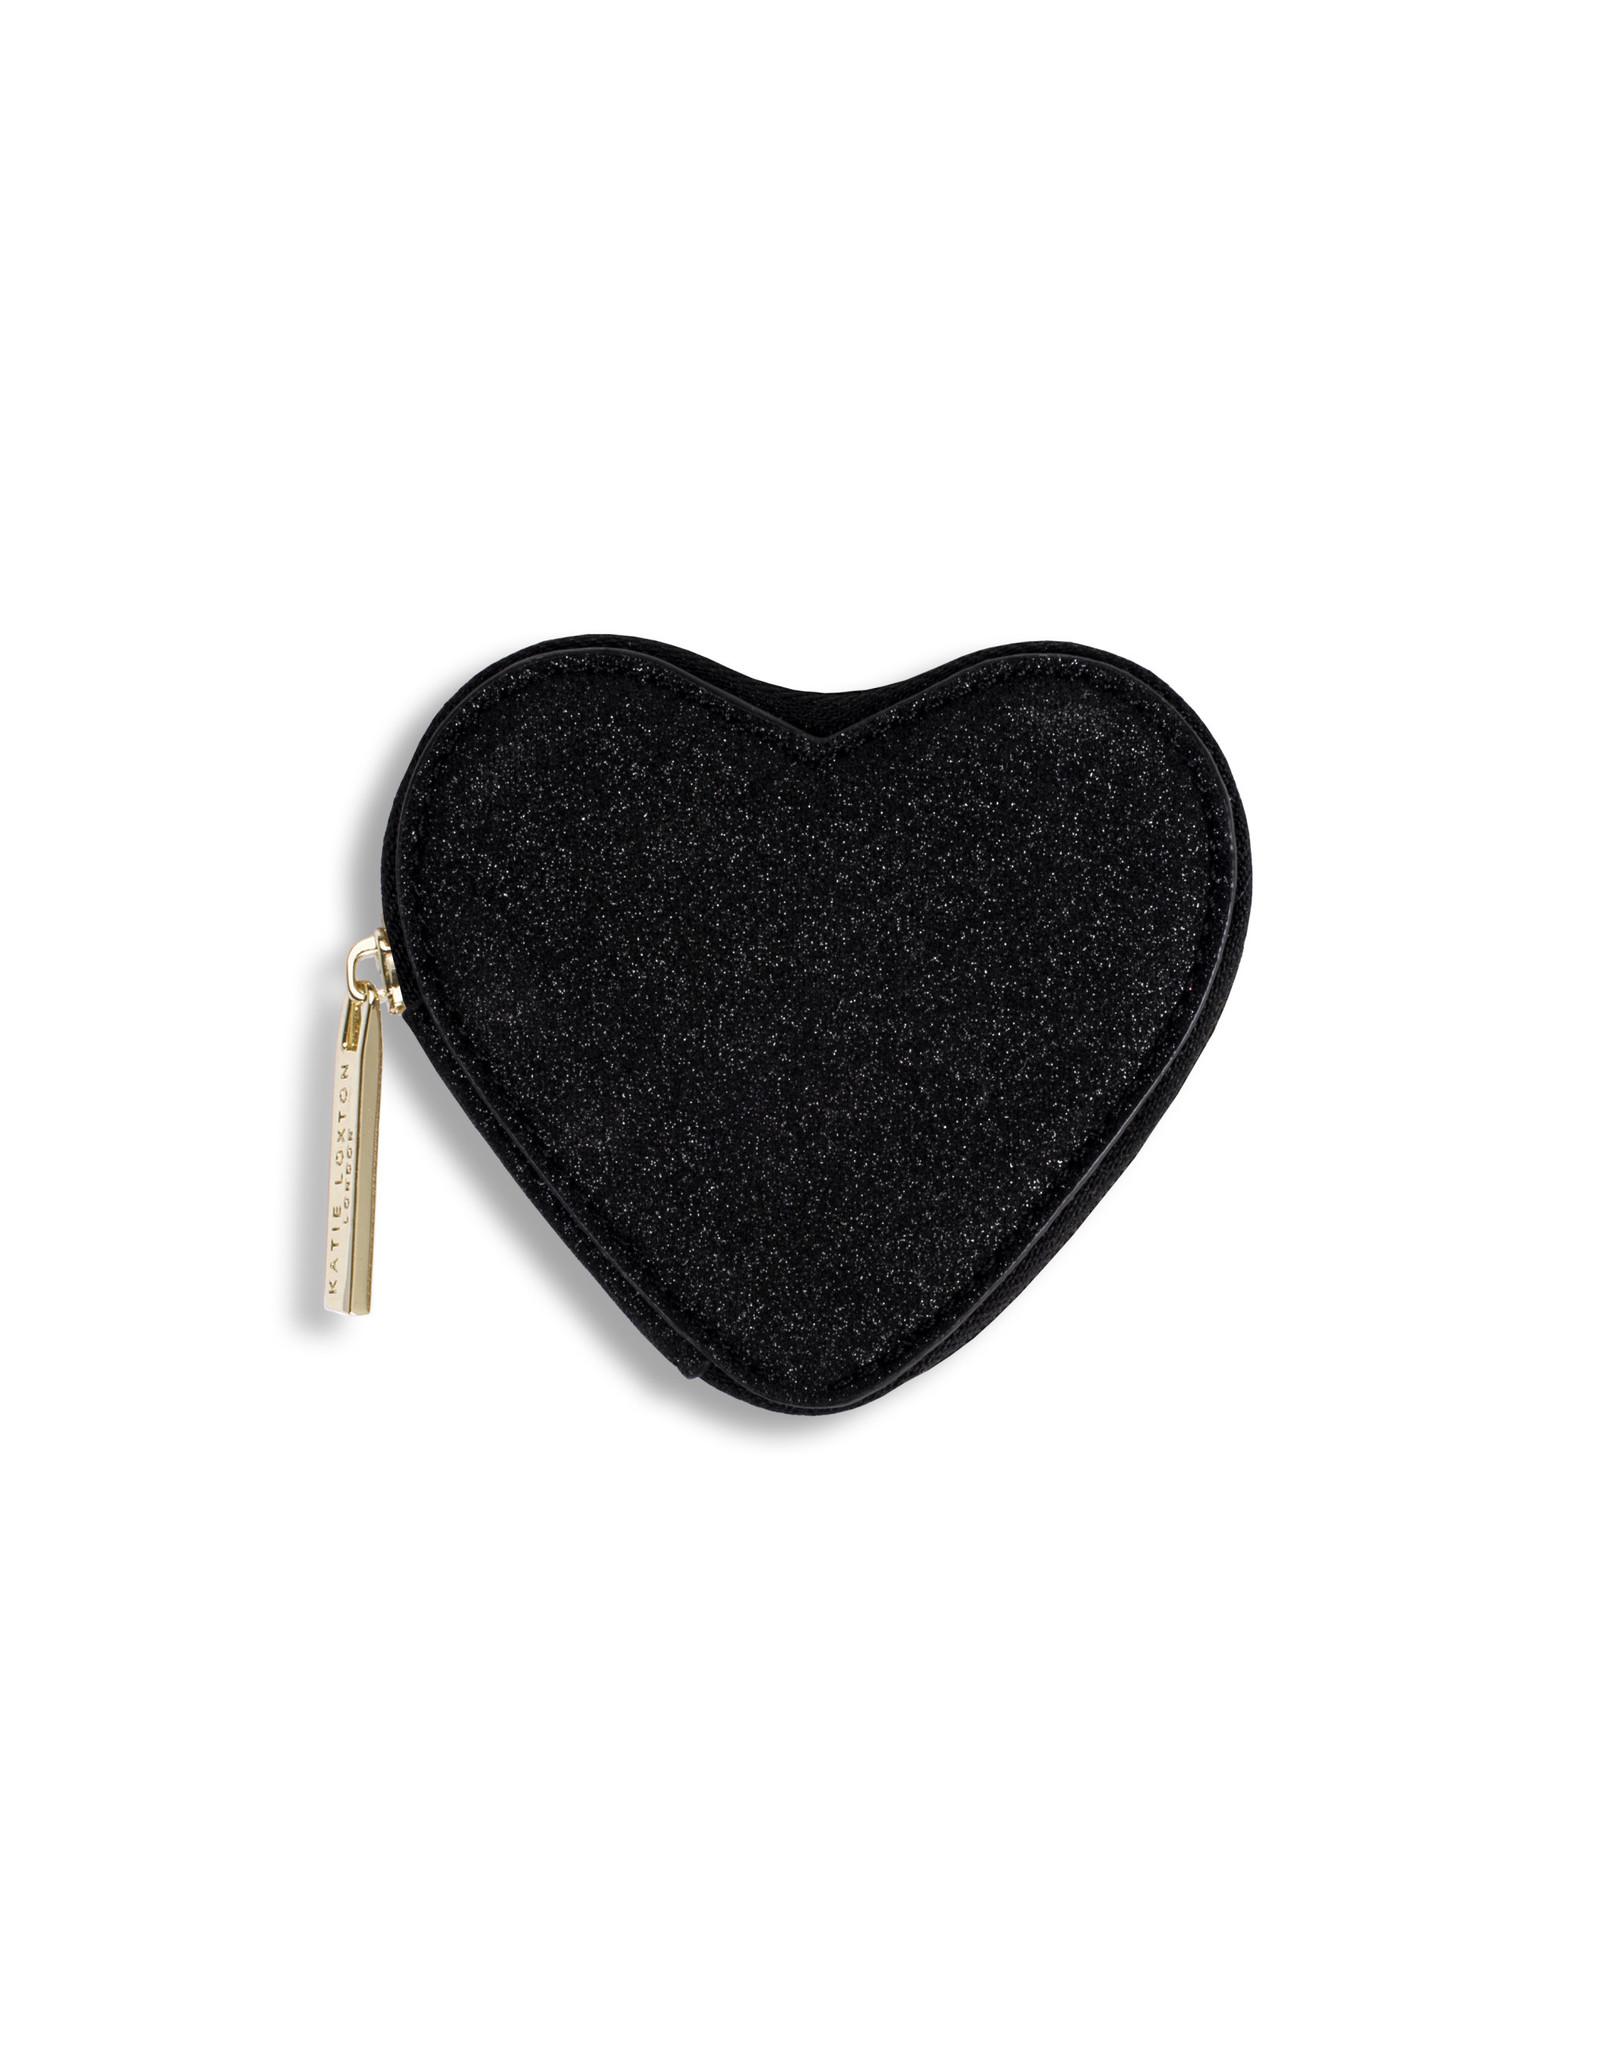 Katie Loxton Geldbeugel - Heart Black Shimmer